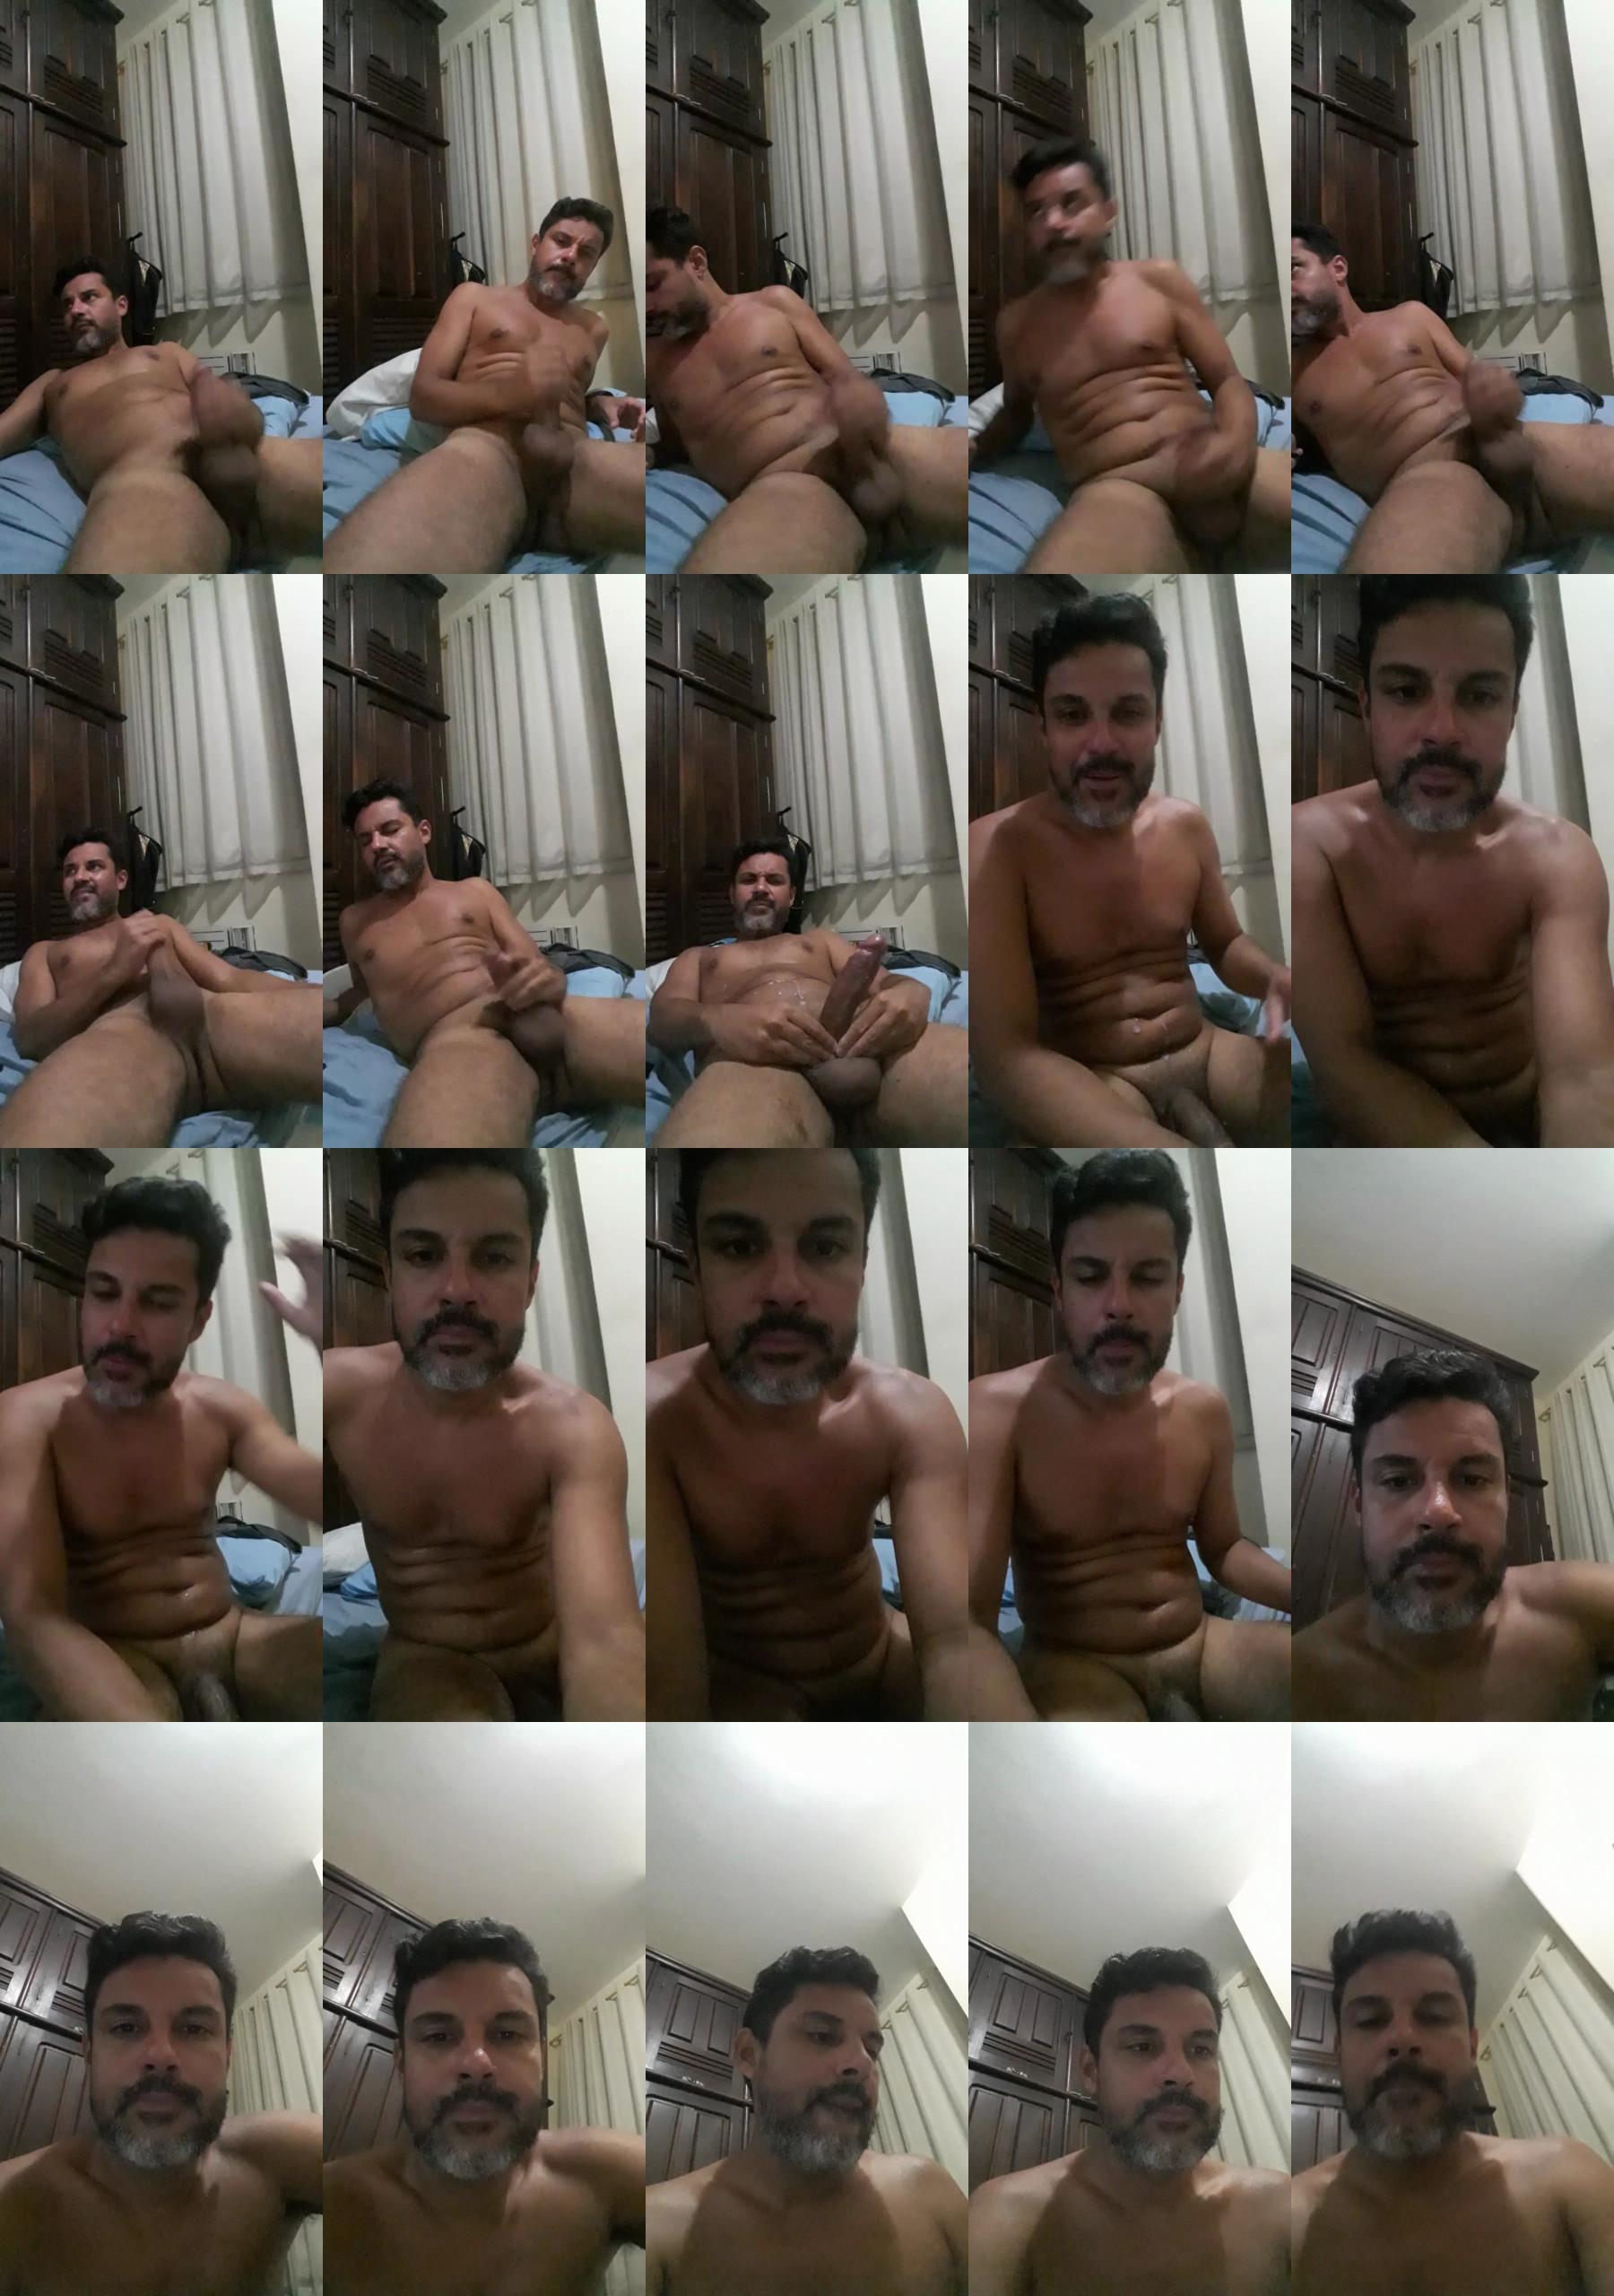 Tony_brazil Cam4 04-05-2021 Recorded Video Webcam